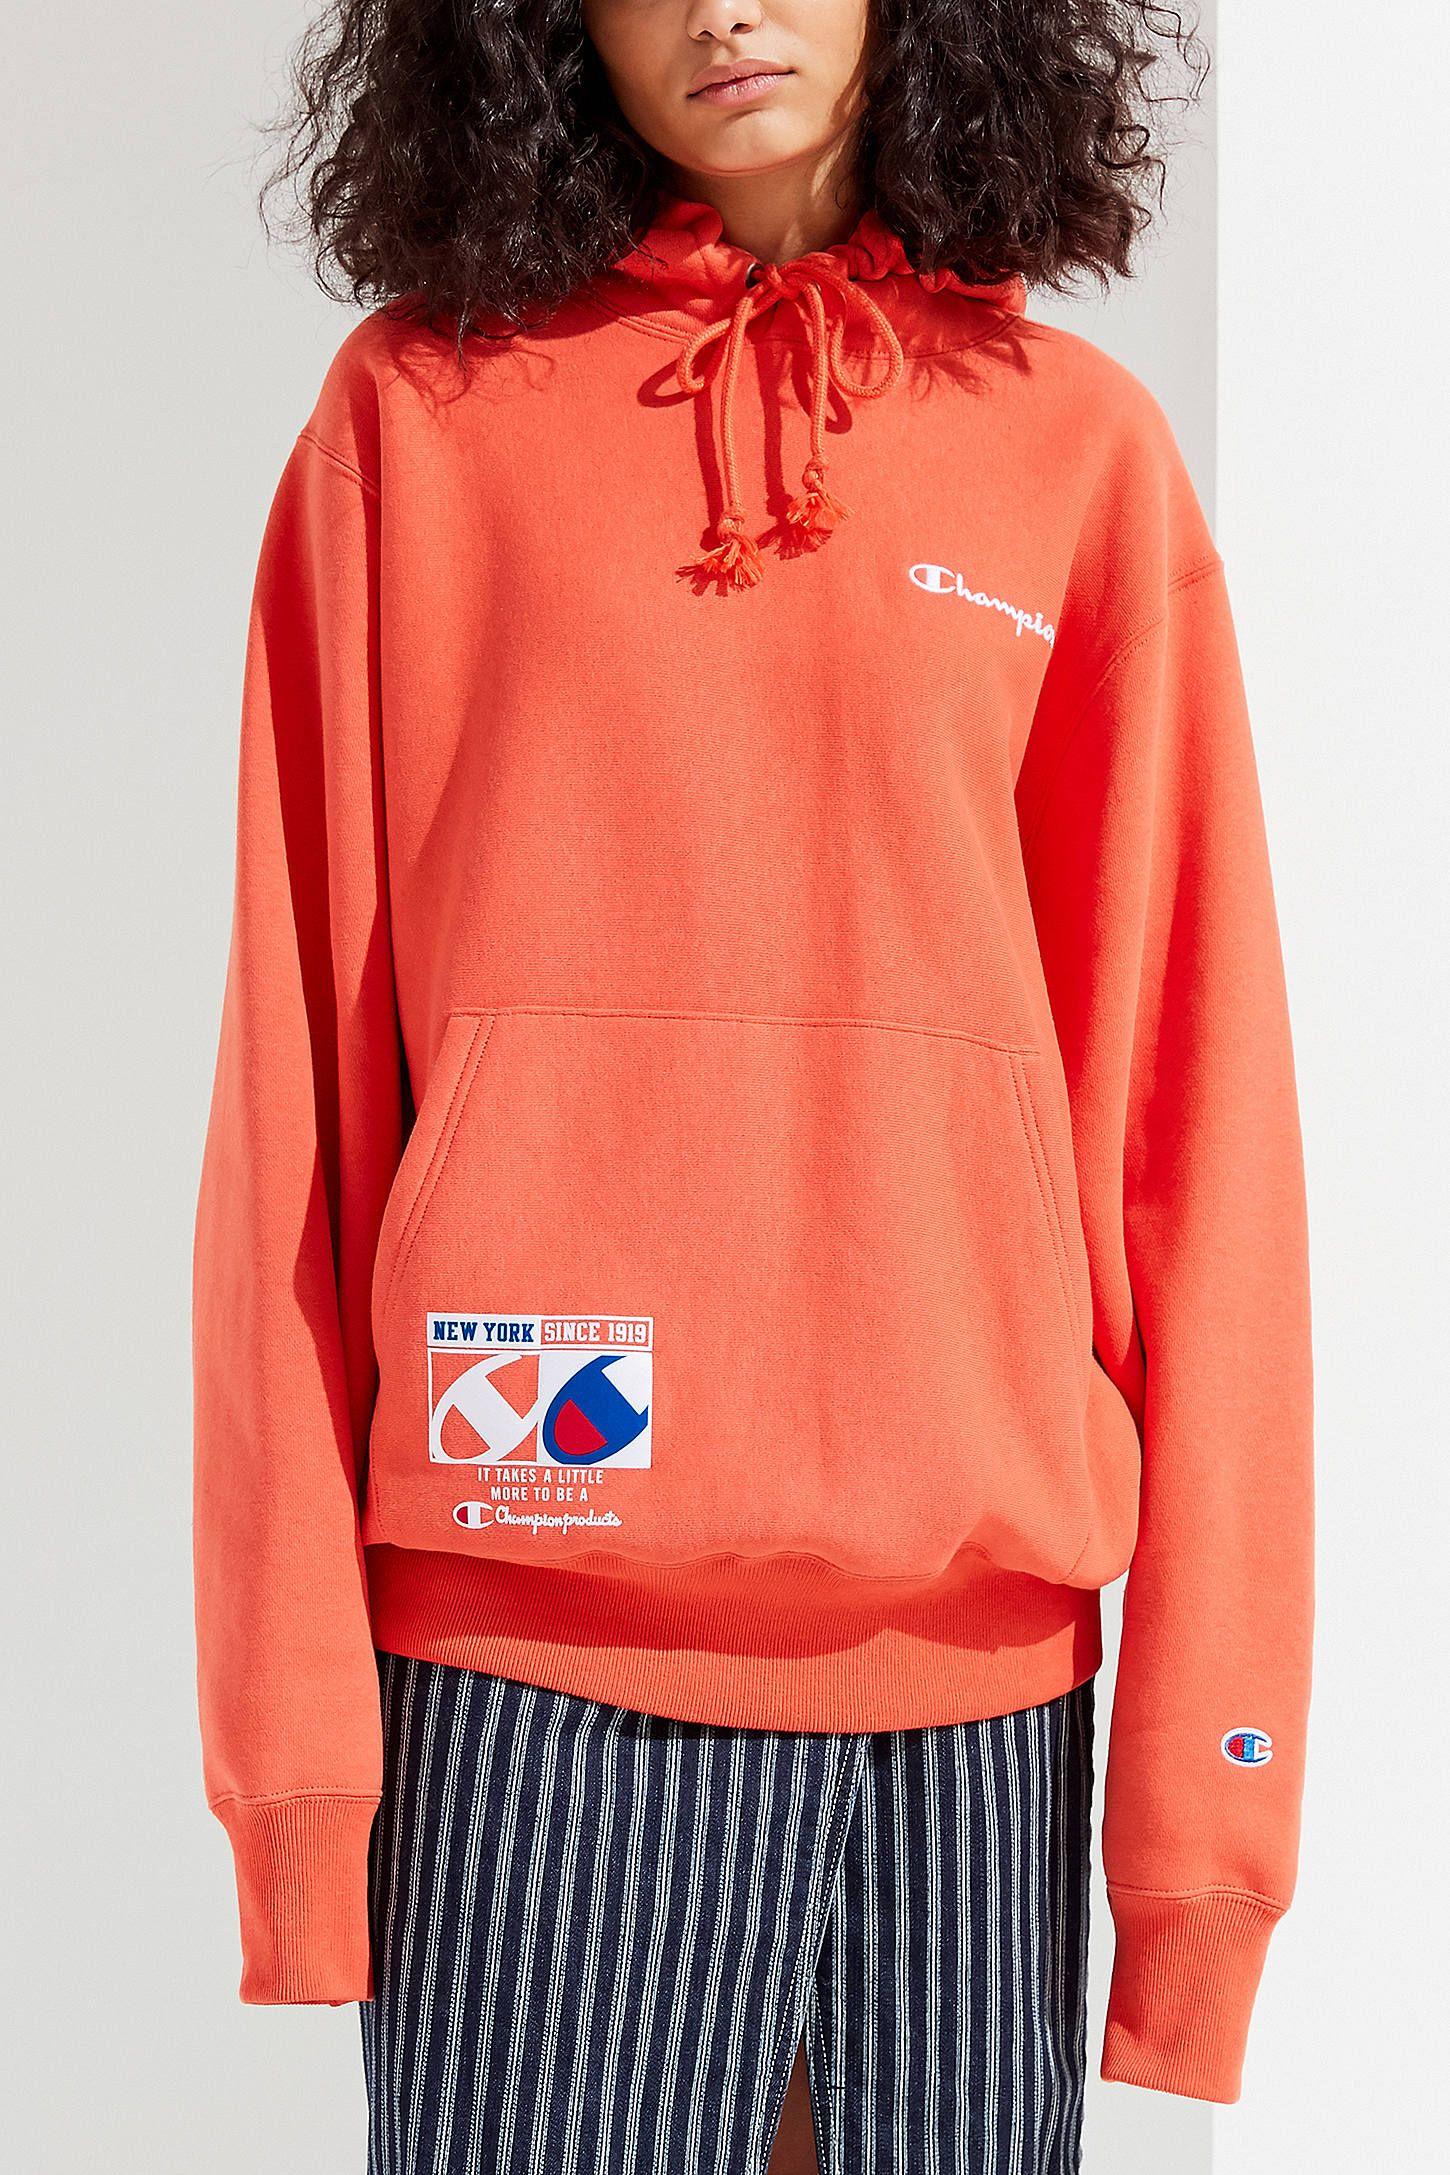 Champion Uo Novelty Graphic Hoodie Sweatshirt [ 2175 x 1450 Pixel ]